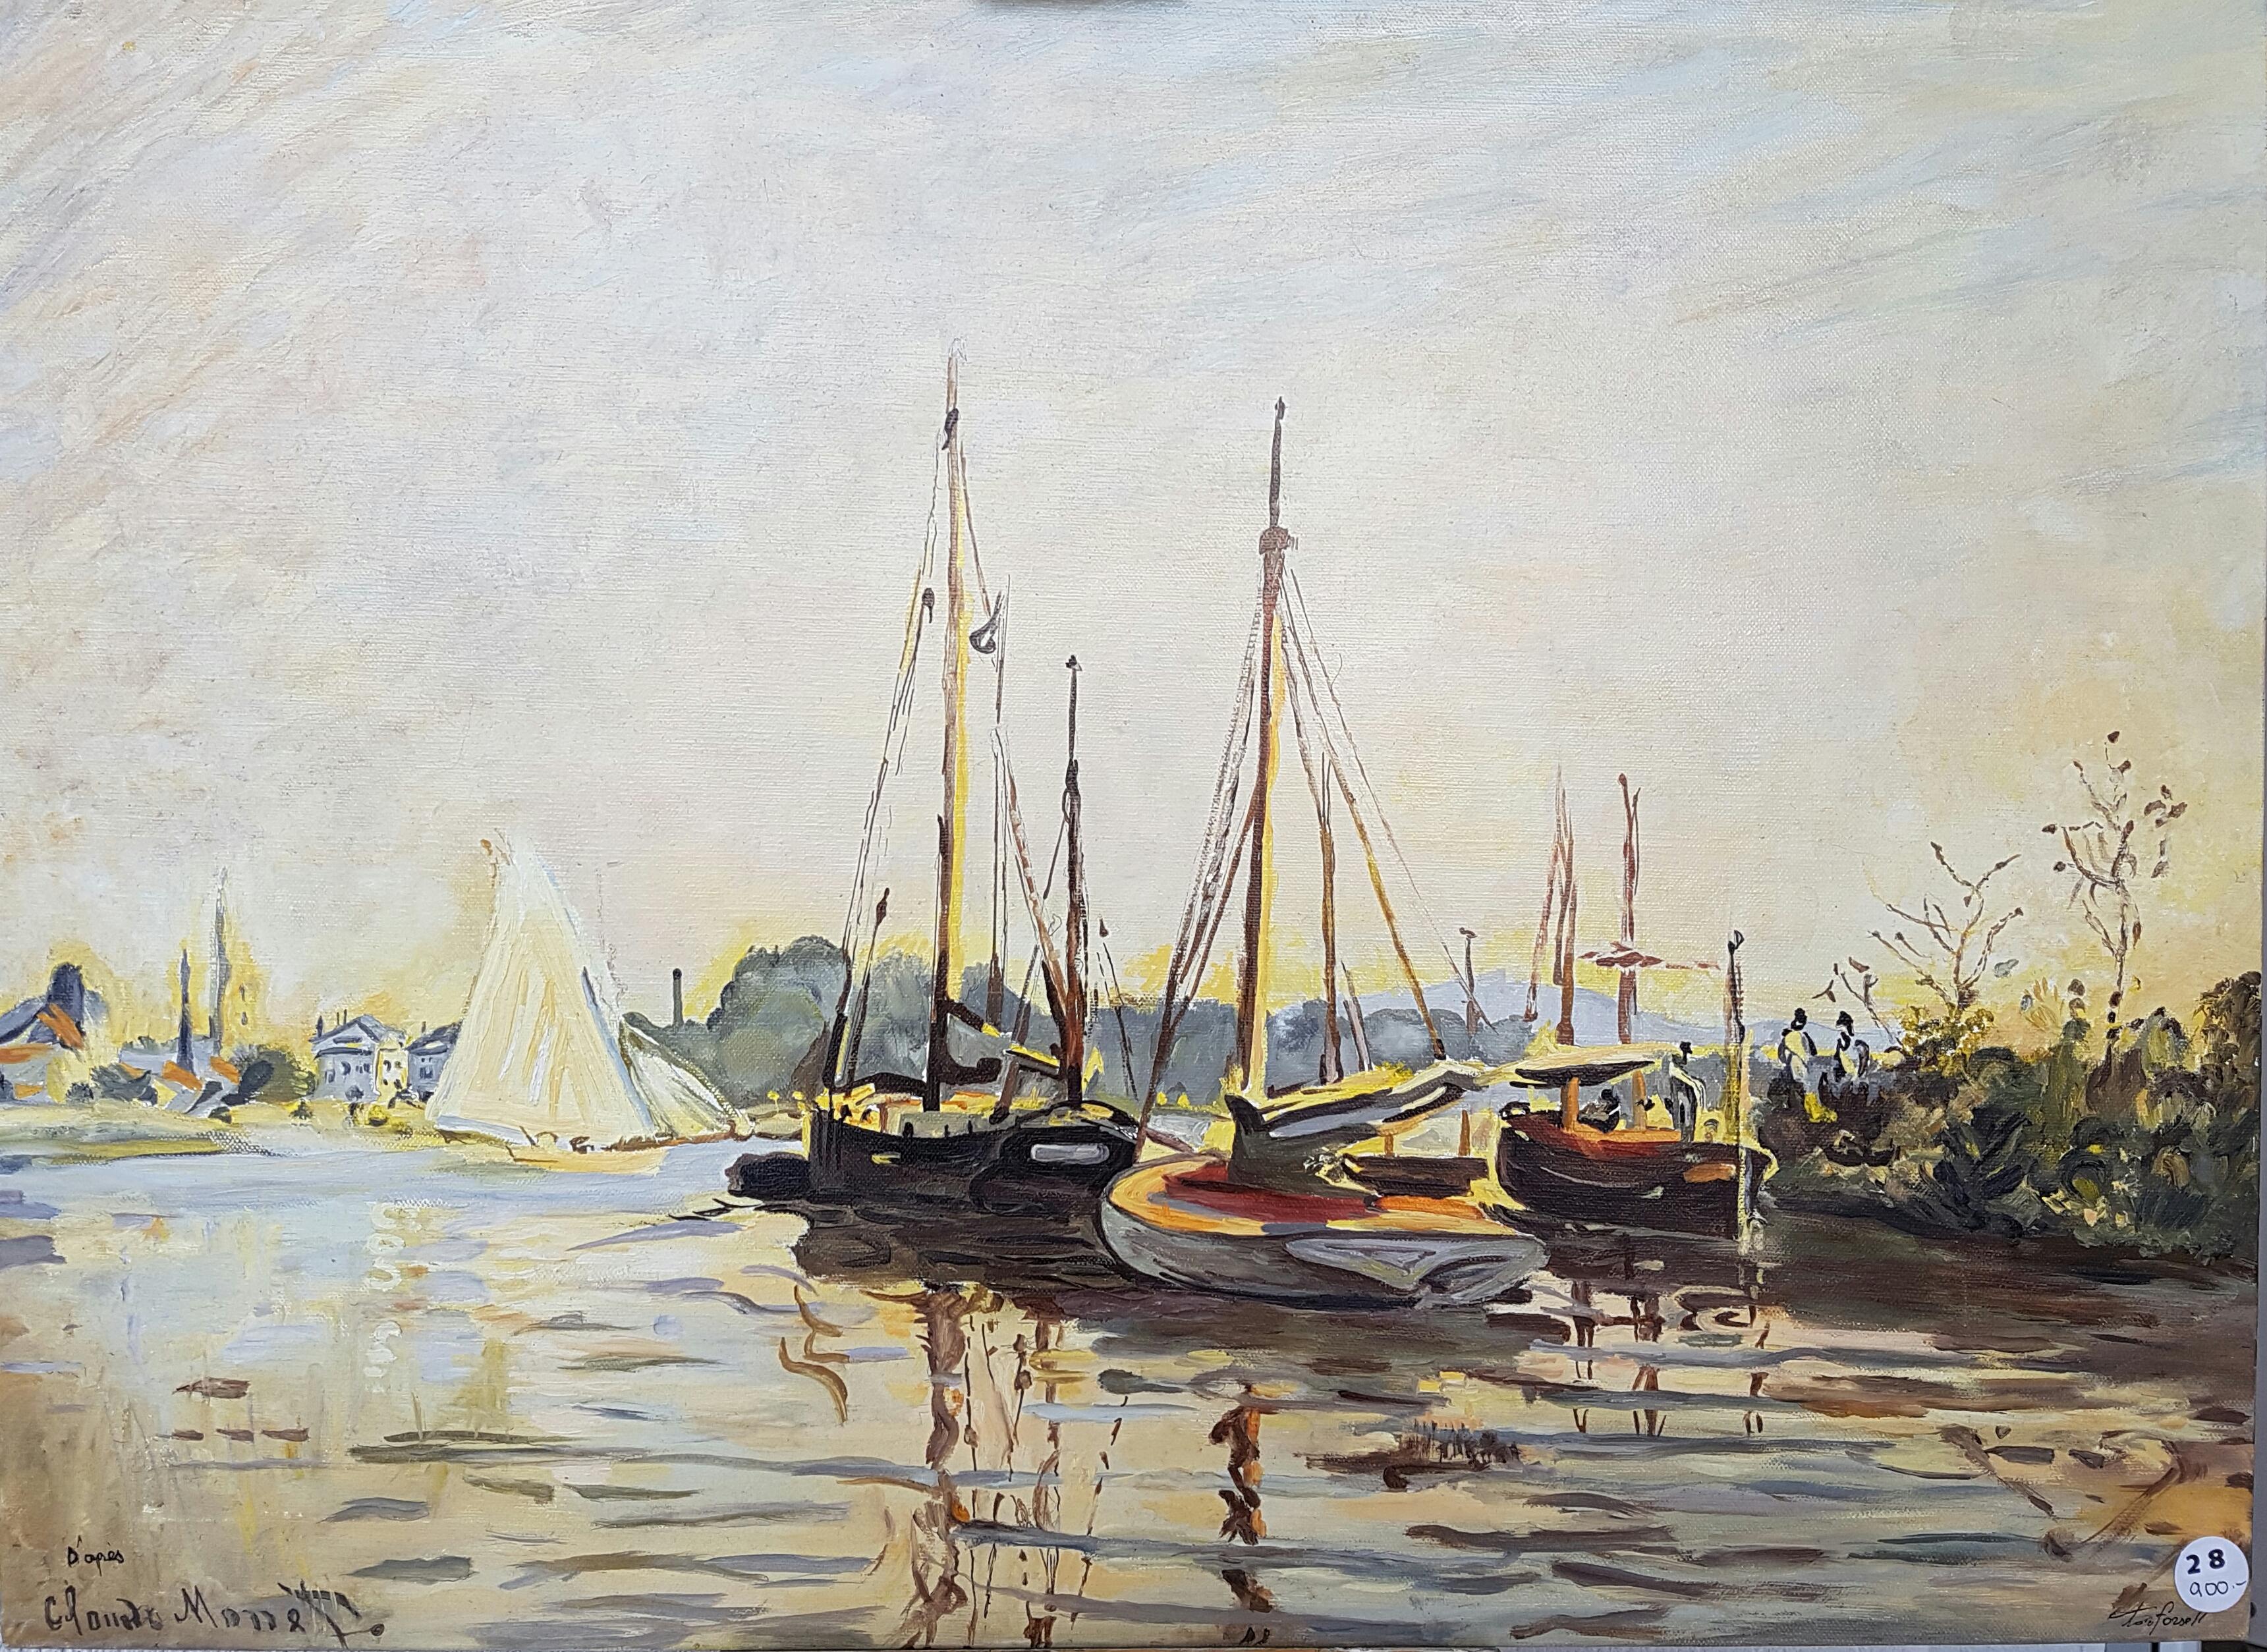 Nadia Forsell d'apres Monet - barques de plaisance.jpg